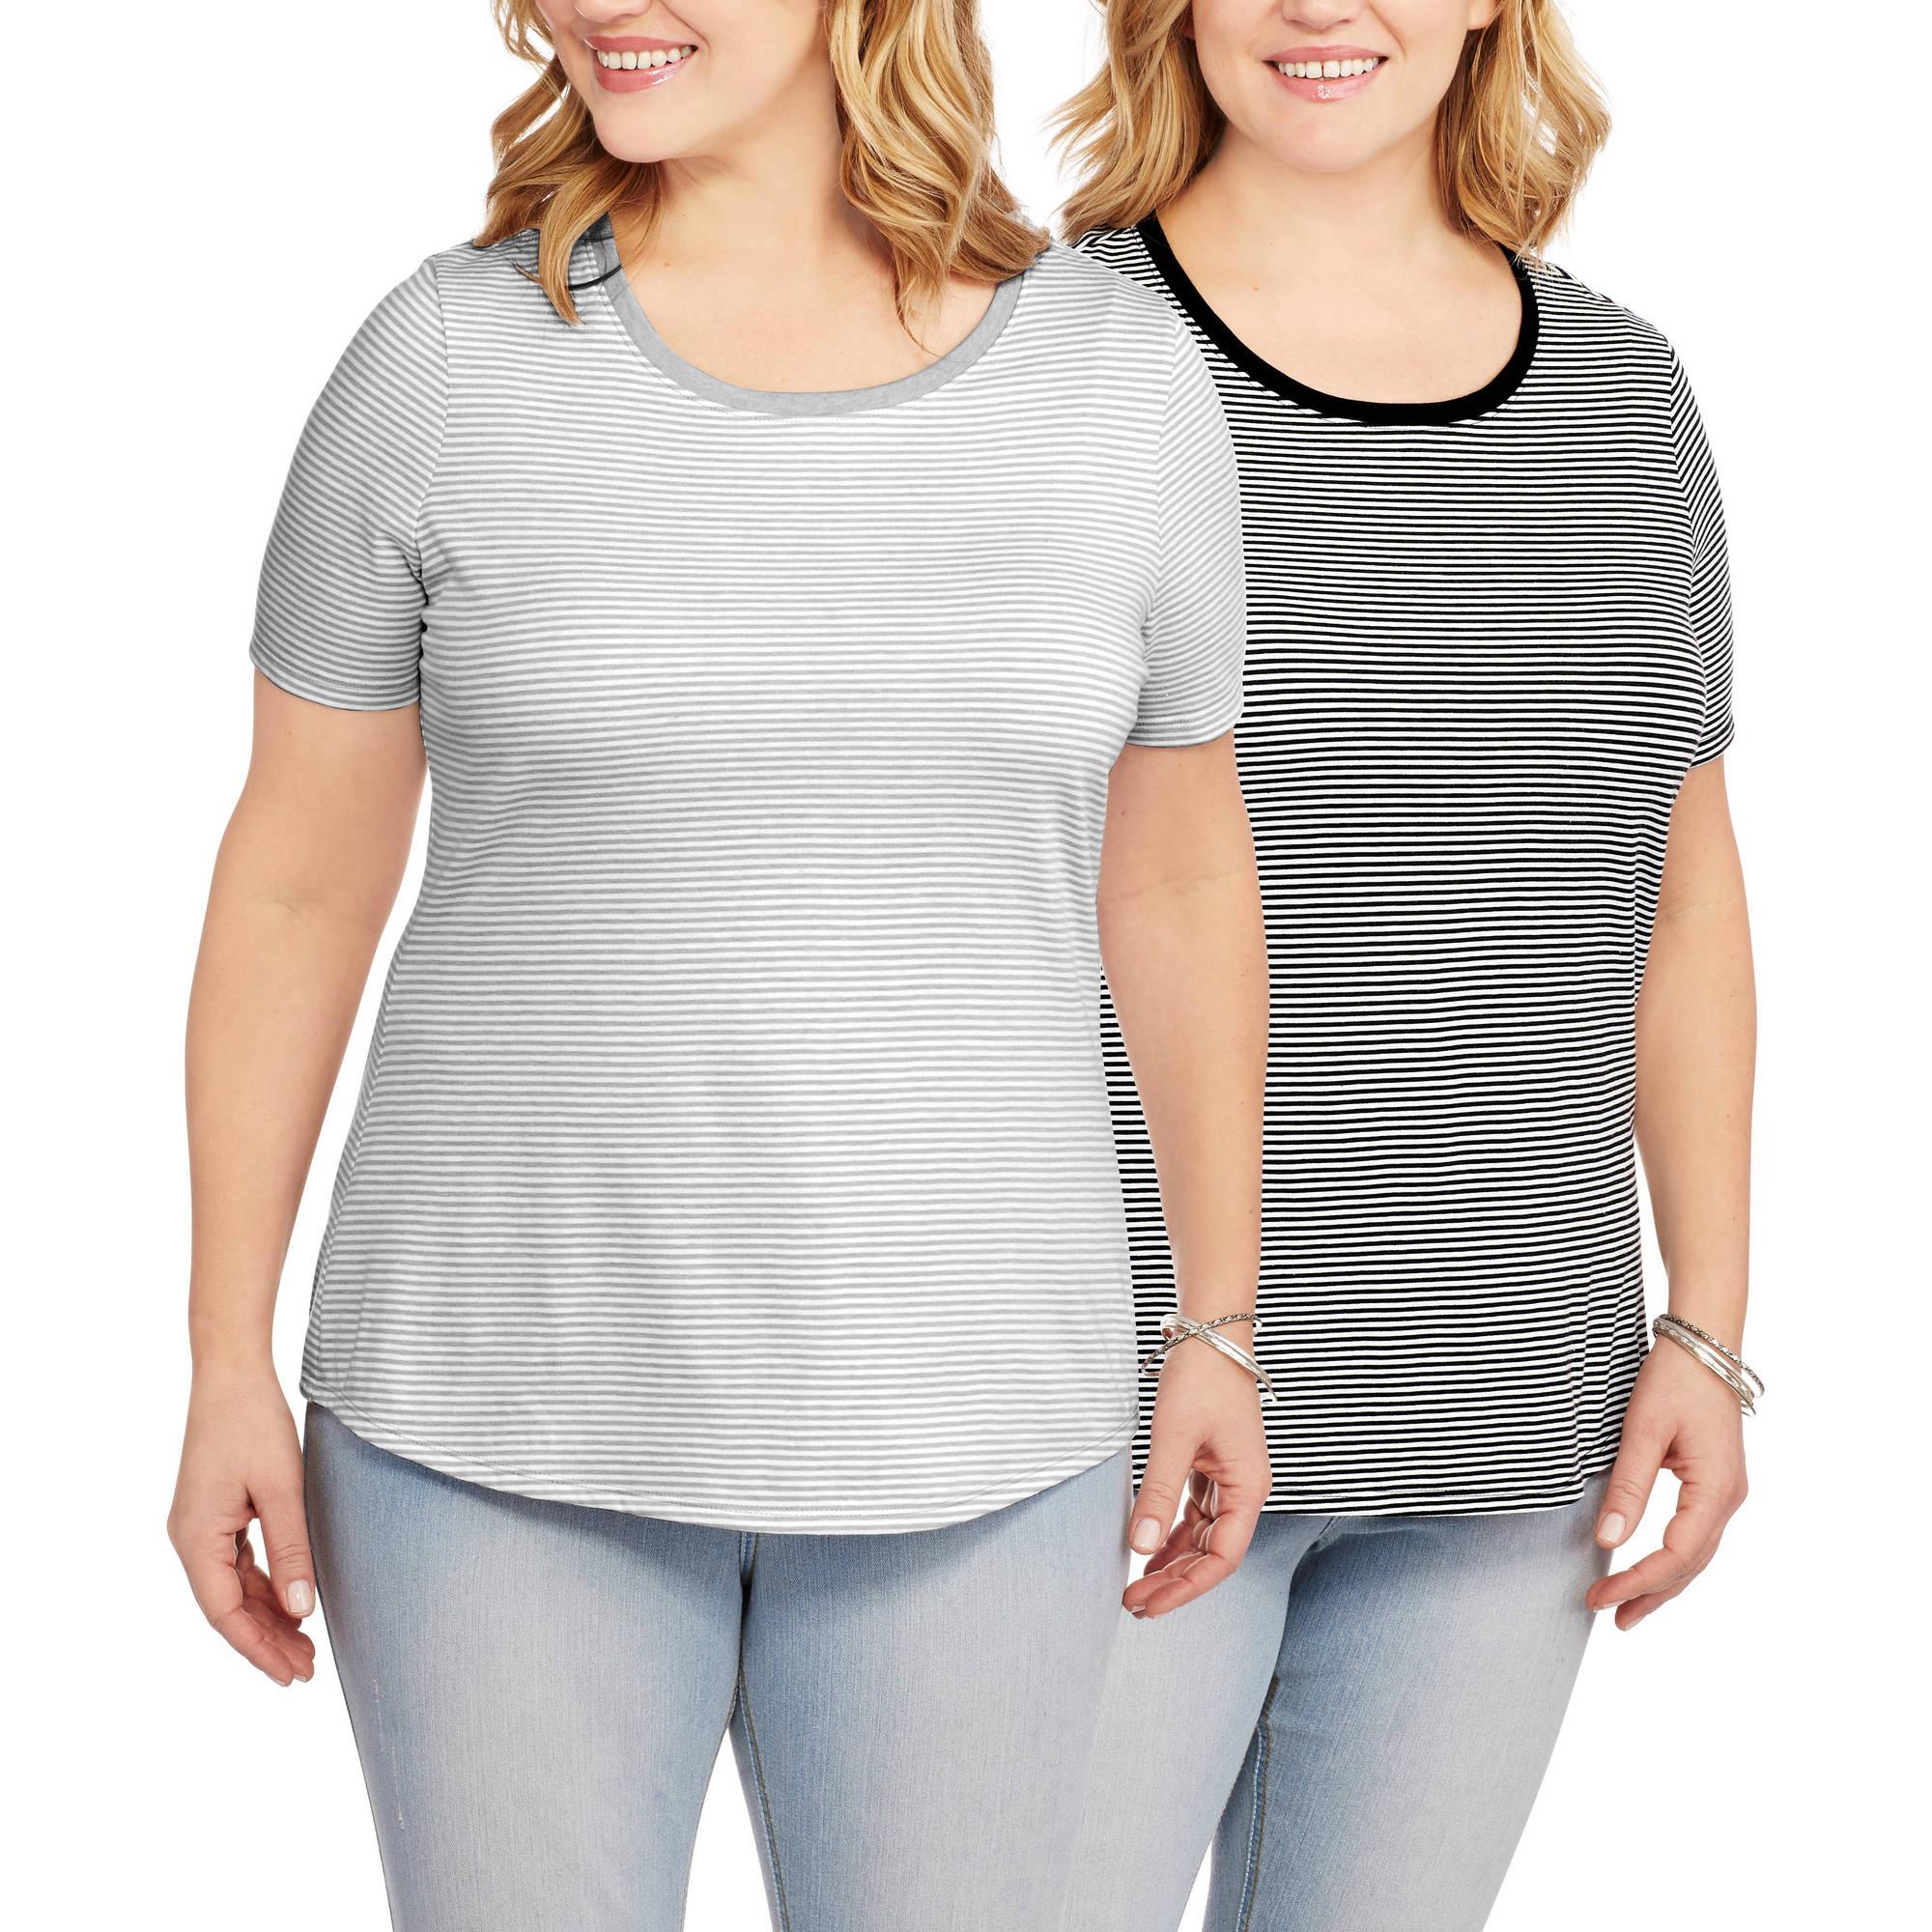 Women's Plus-Size Short Sleeve Crew Neck Tee, 2 Pack Value Bundle